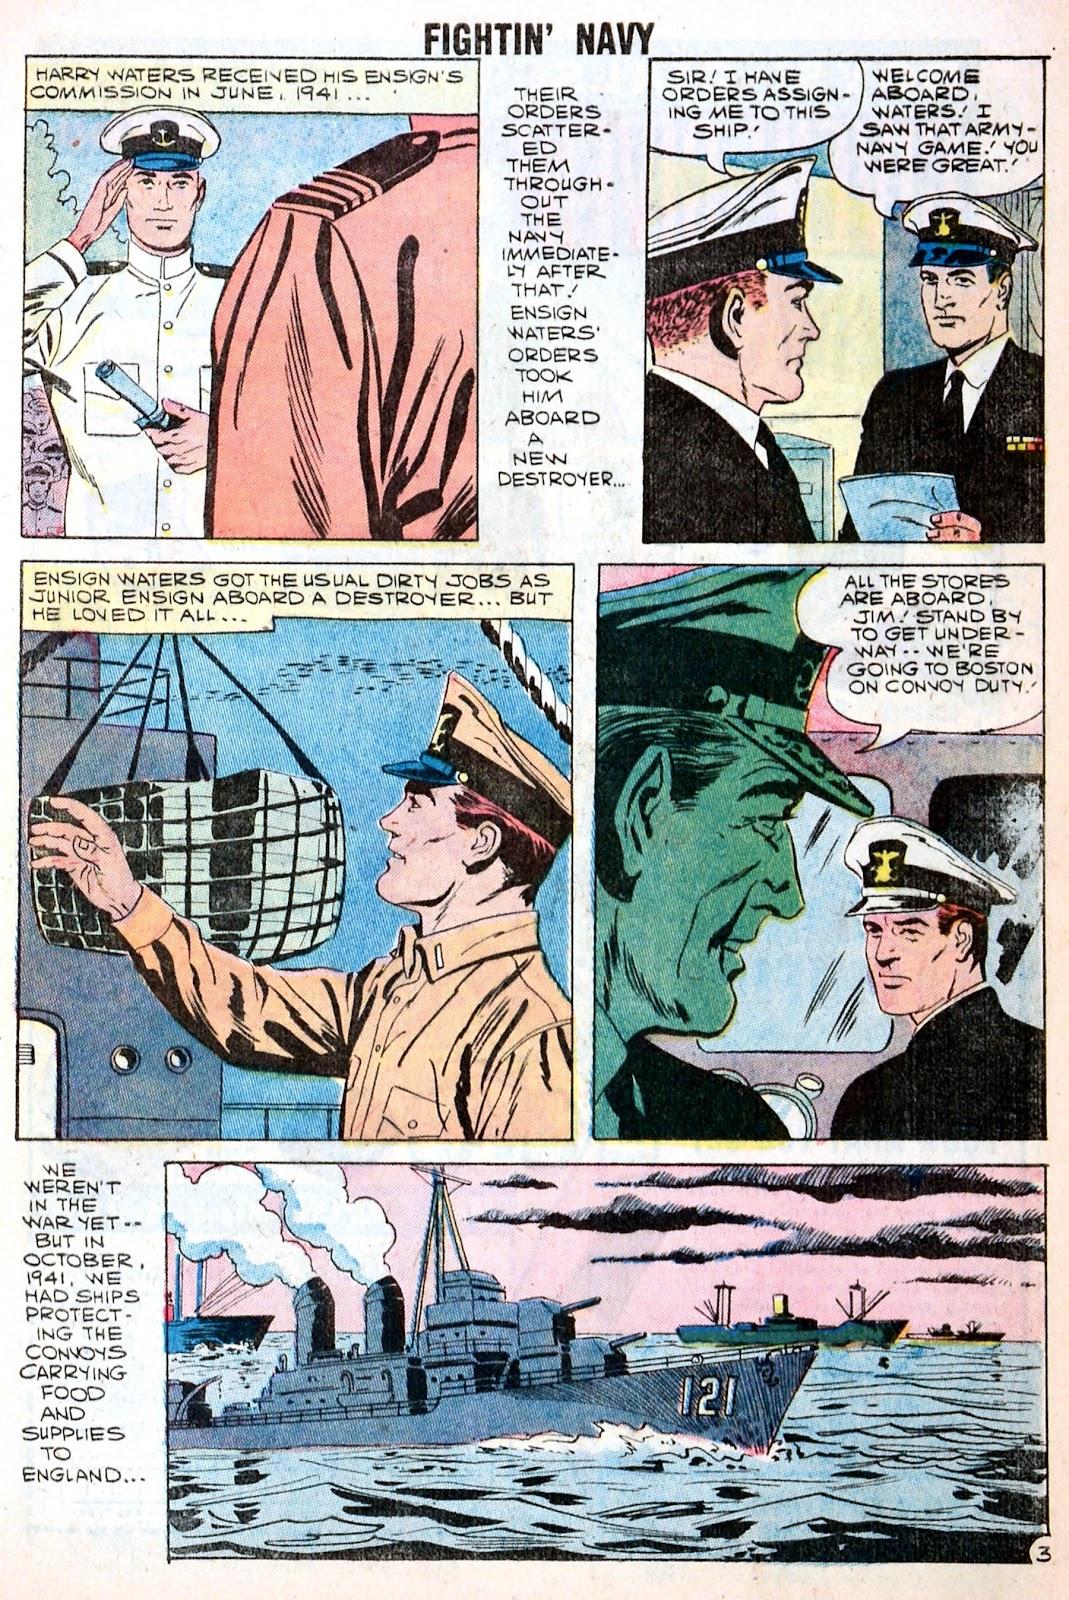 Read online Fightin' Navy comic -  Issue #85 - 5